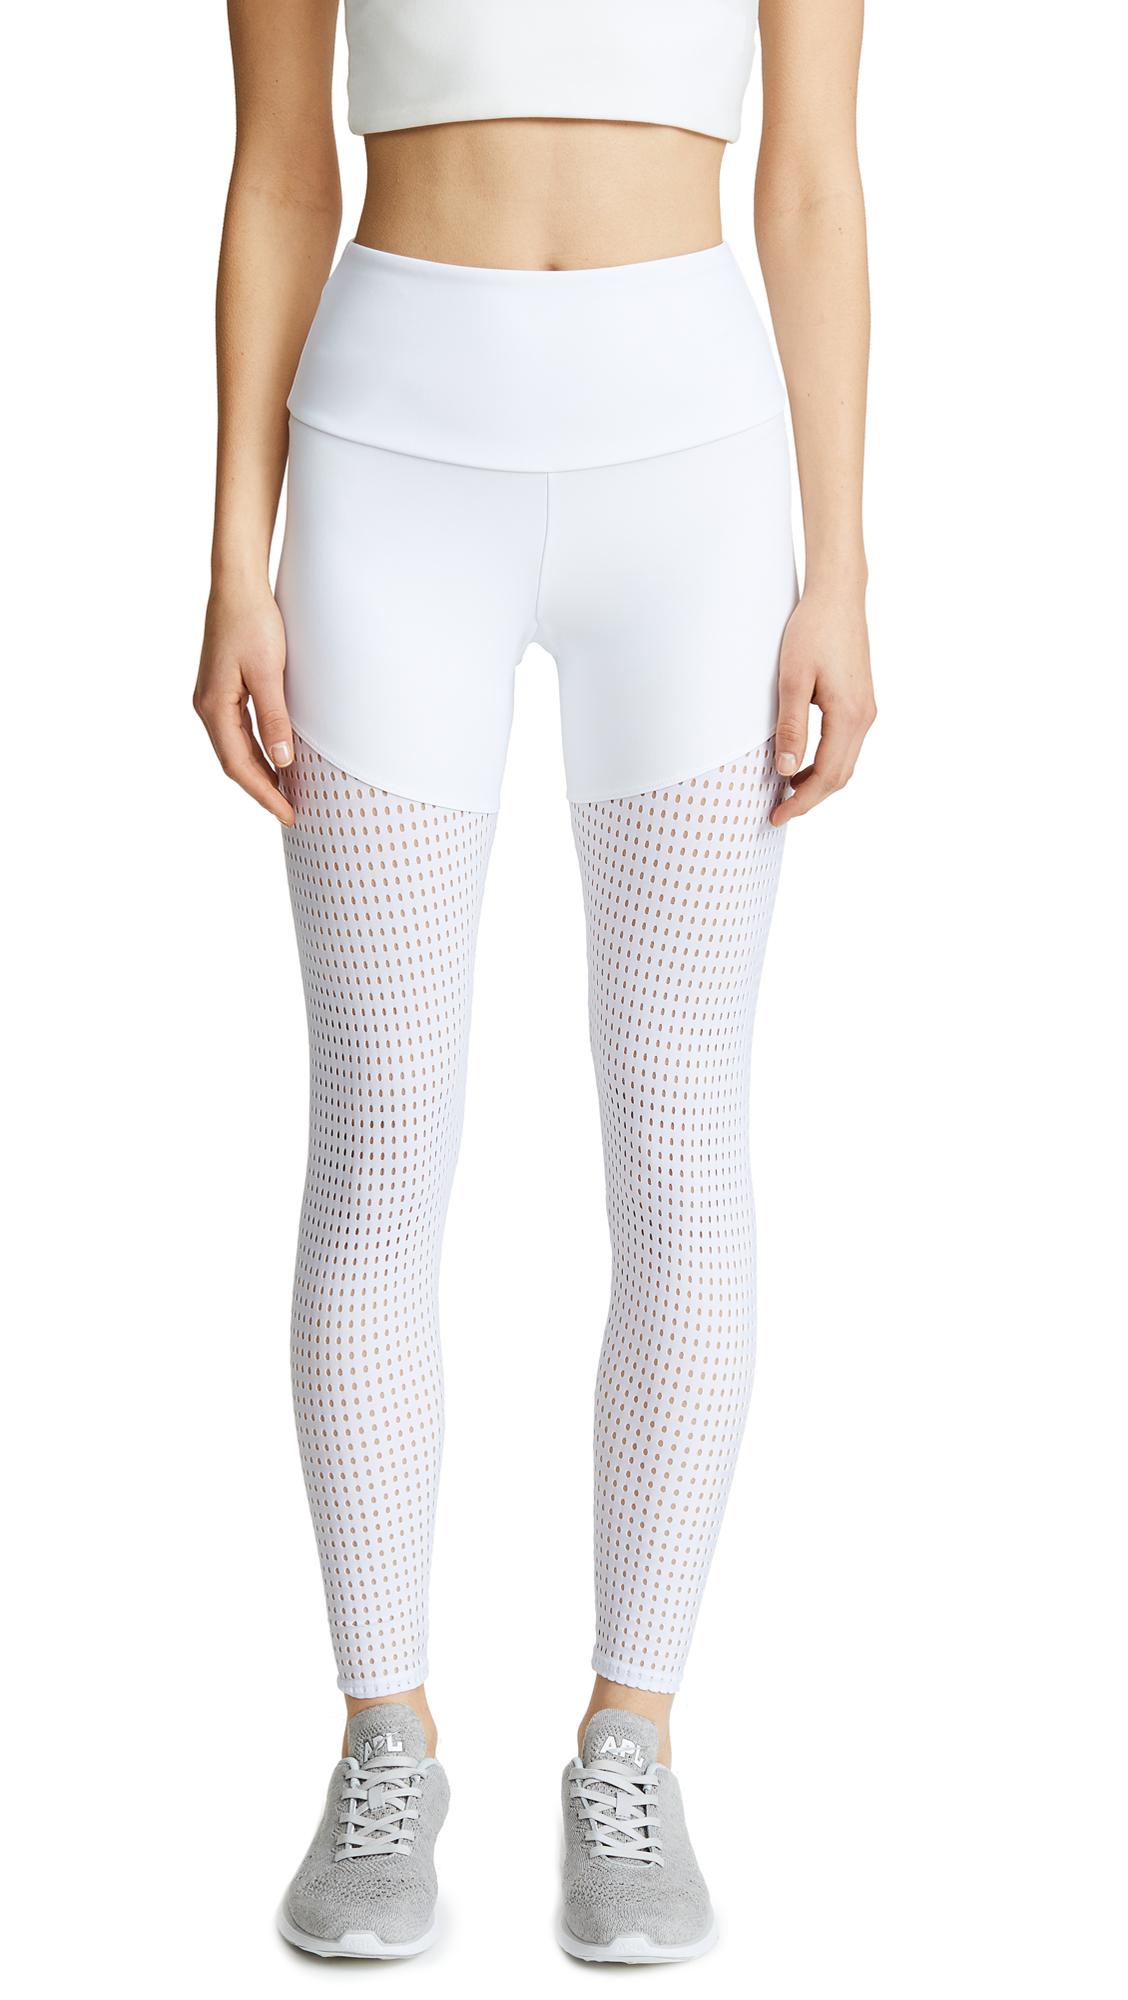 Onzie Half/Half 2.0 Leggings In White